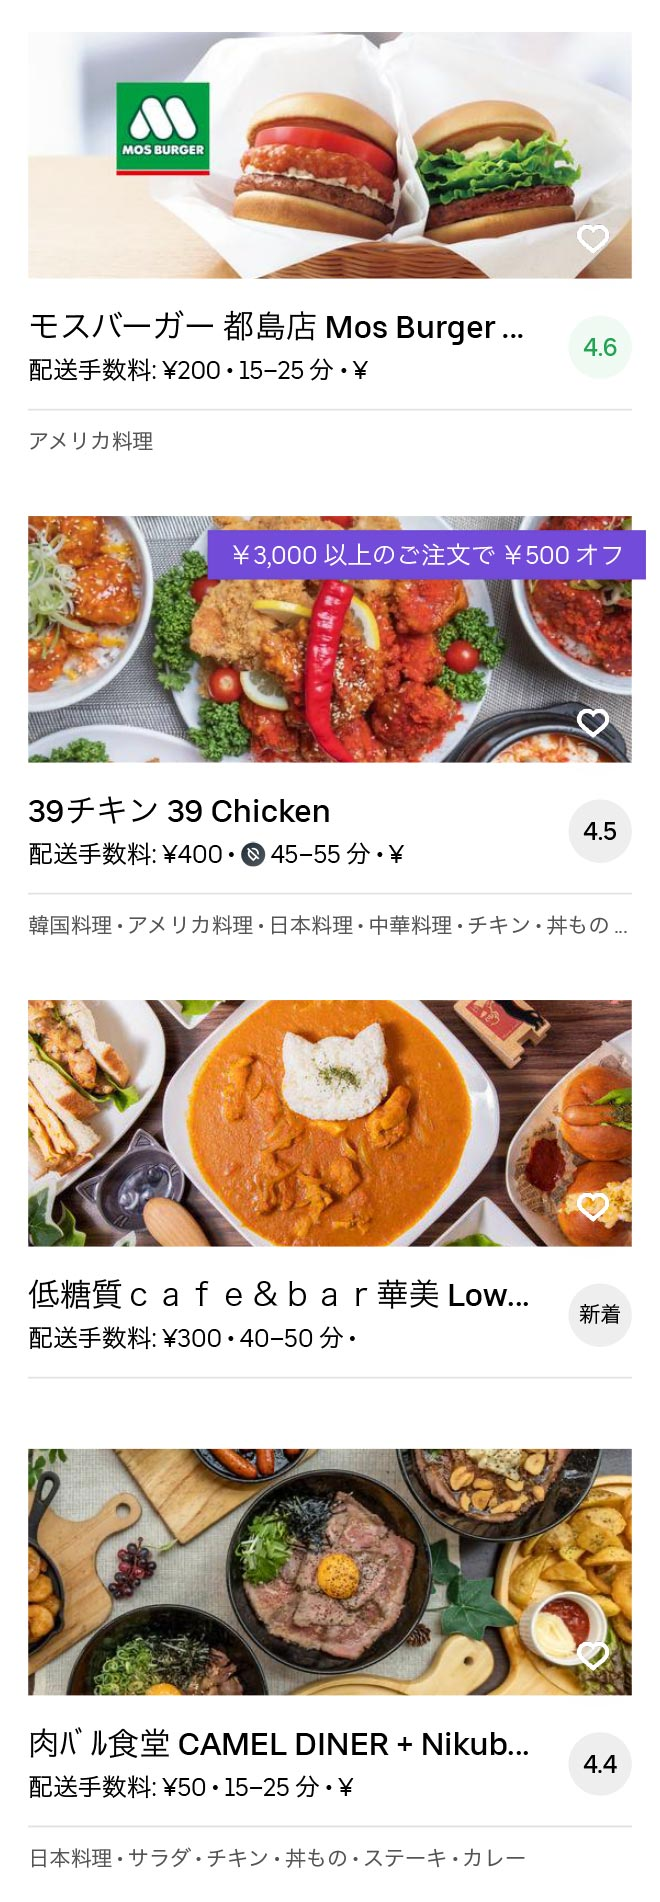 Osaka kyobashi menu 2005 04